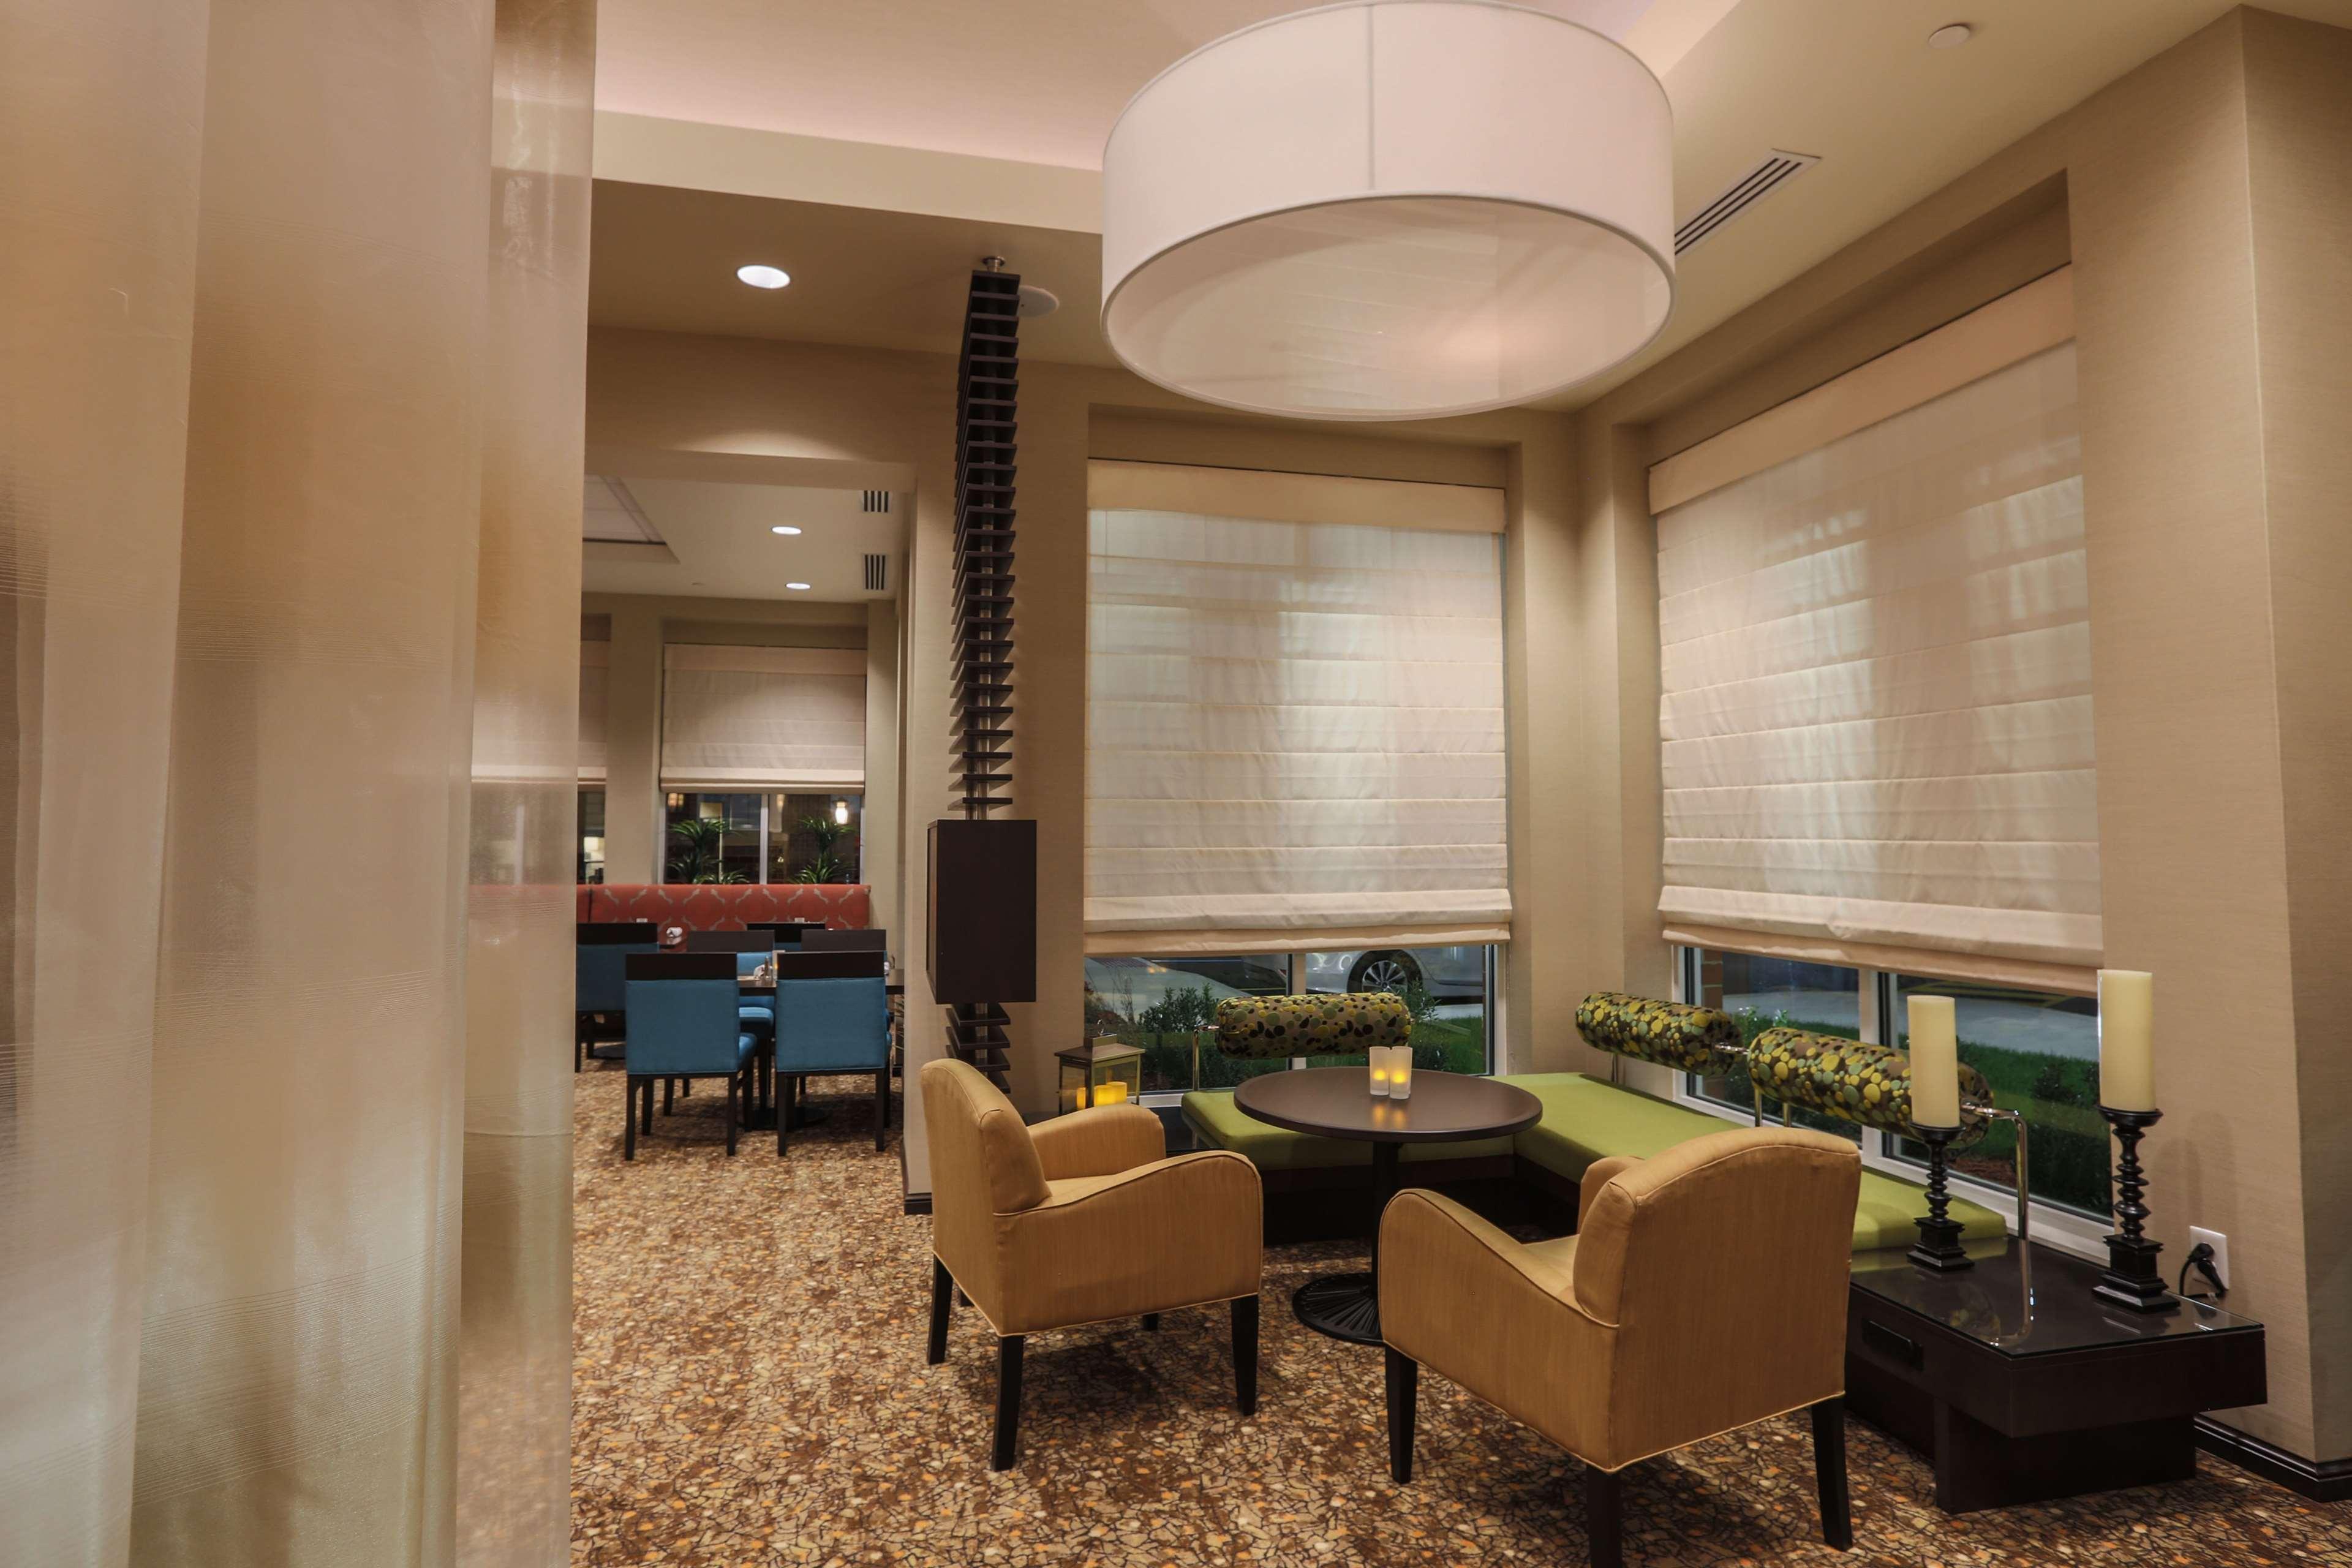 Hilton Garden Inn Indiana at IUP image 7